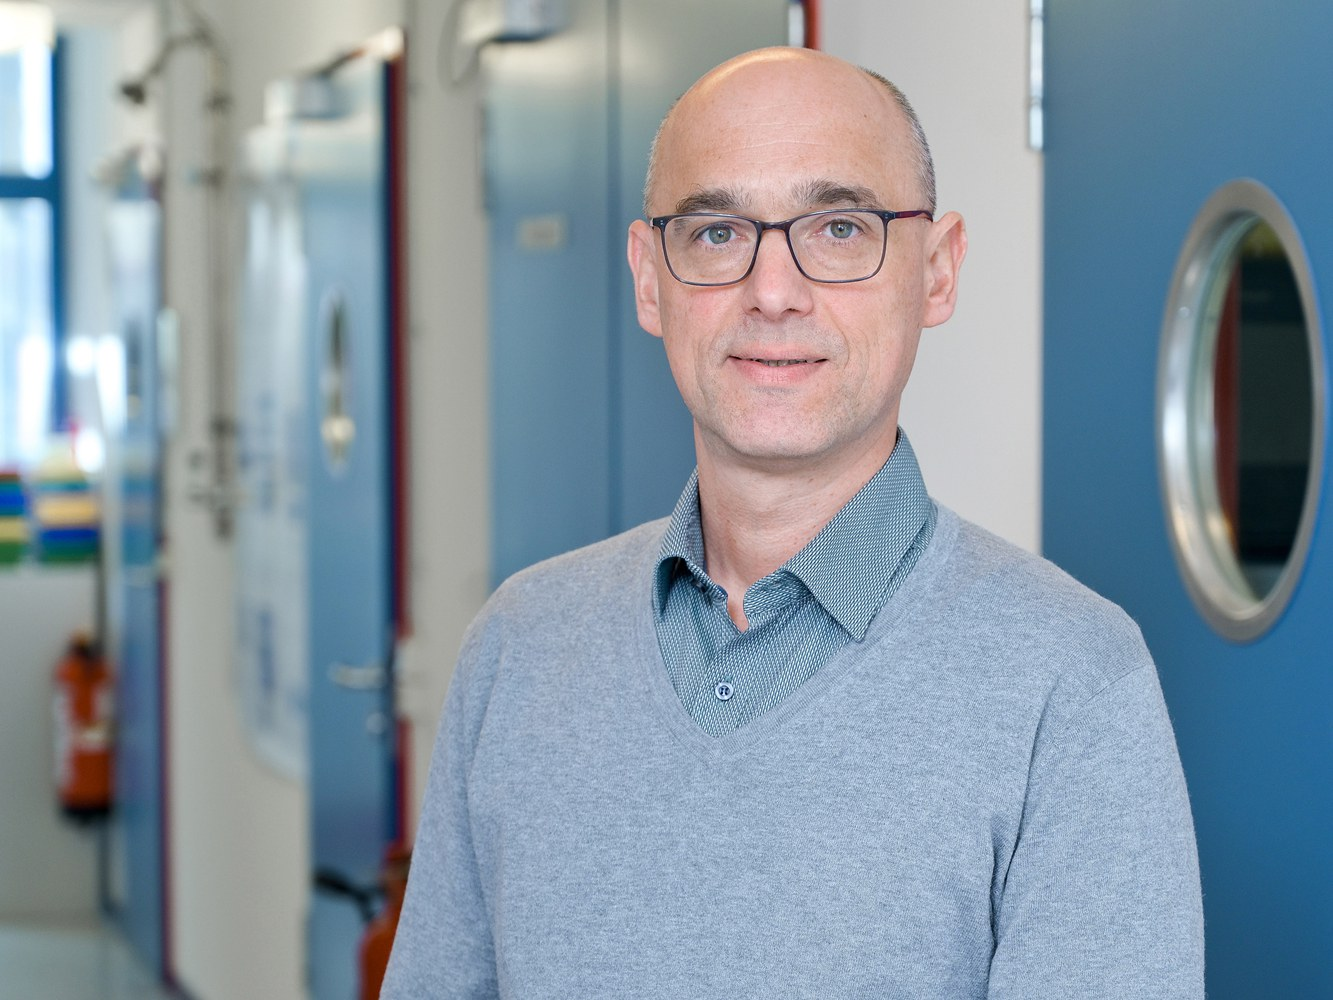 The neuropharmacologist Prof. Dr. Ralf Stumm